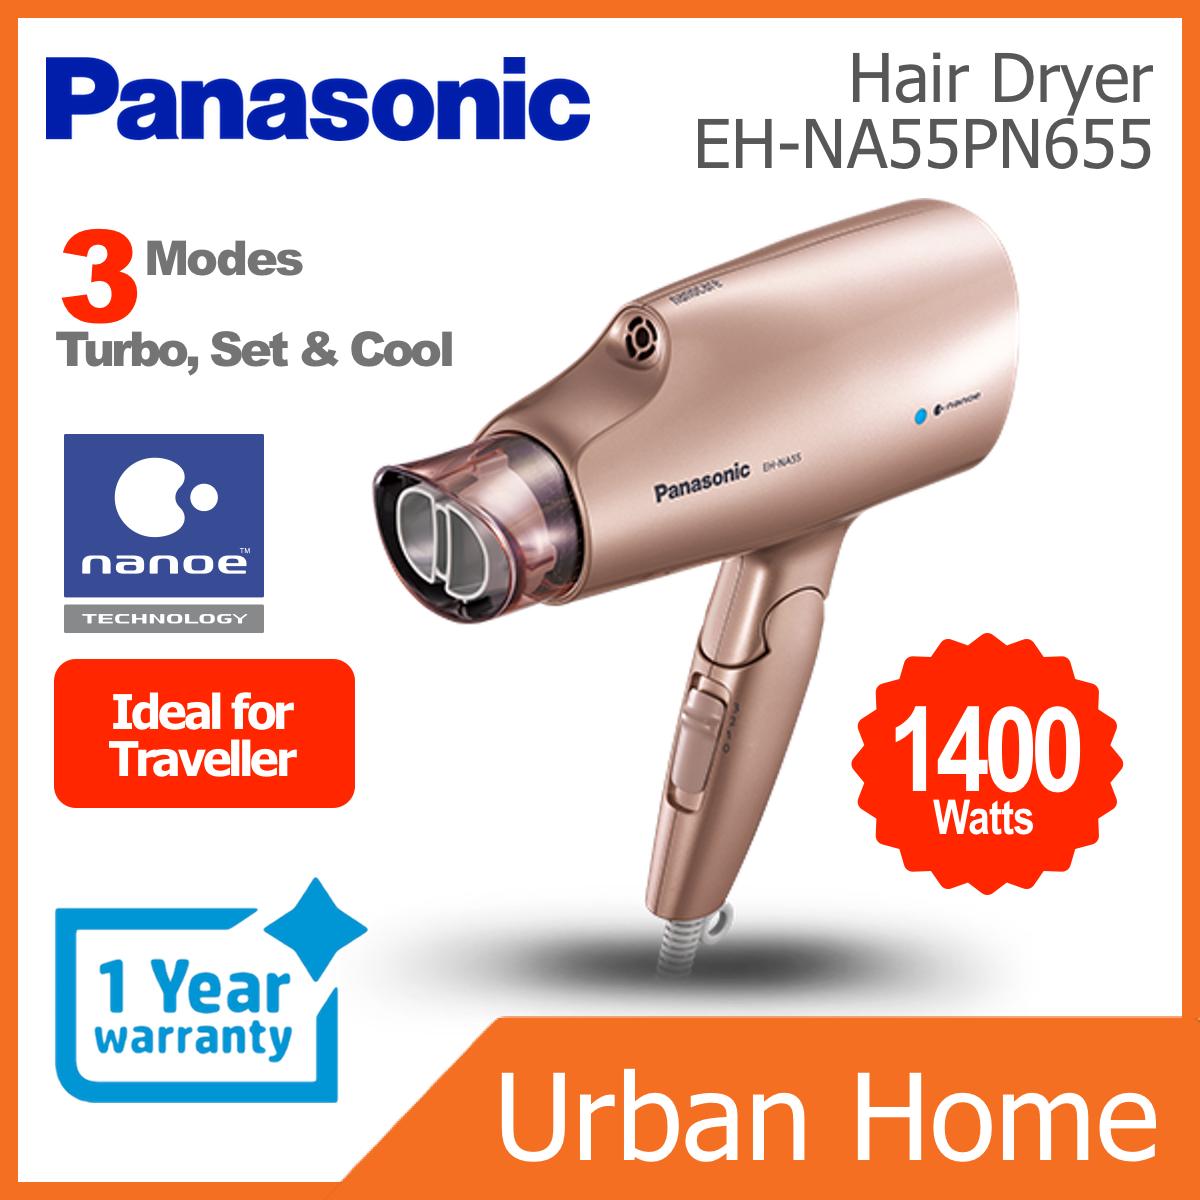 PANASONIC Dual Voltage Travel nanoe Hair Dryer (EH-NA55/EH-NA55PN655/EHNA55/EHNA55PN655)